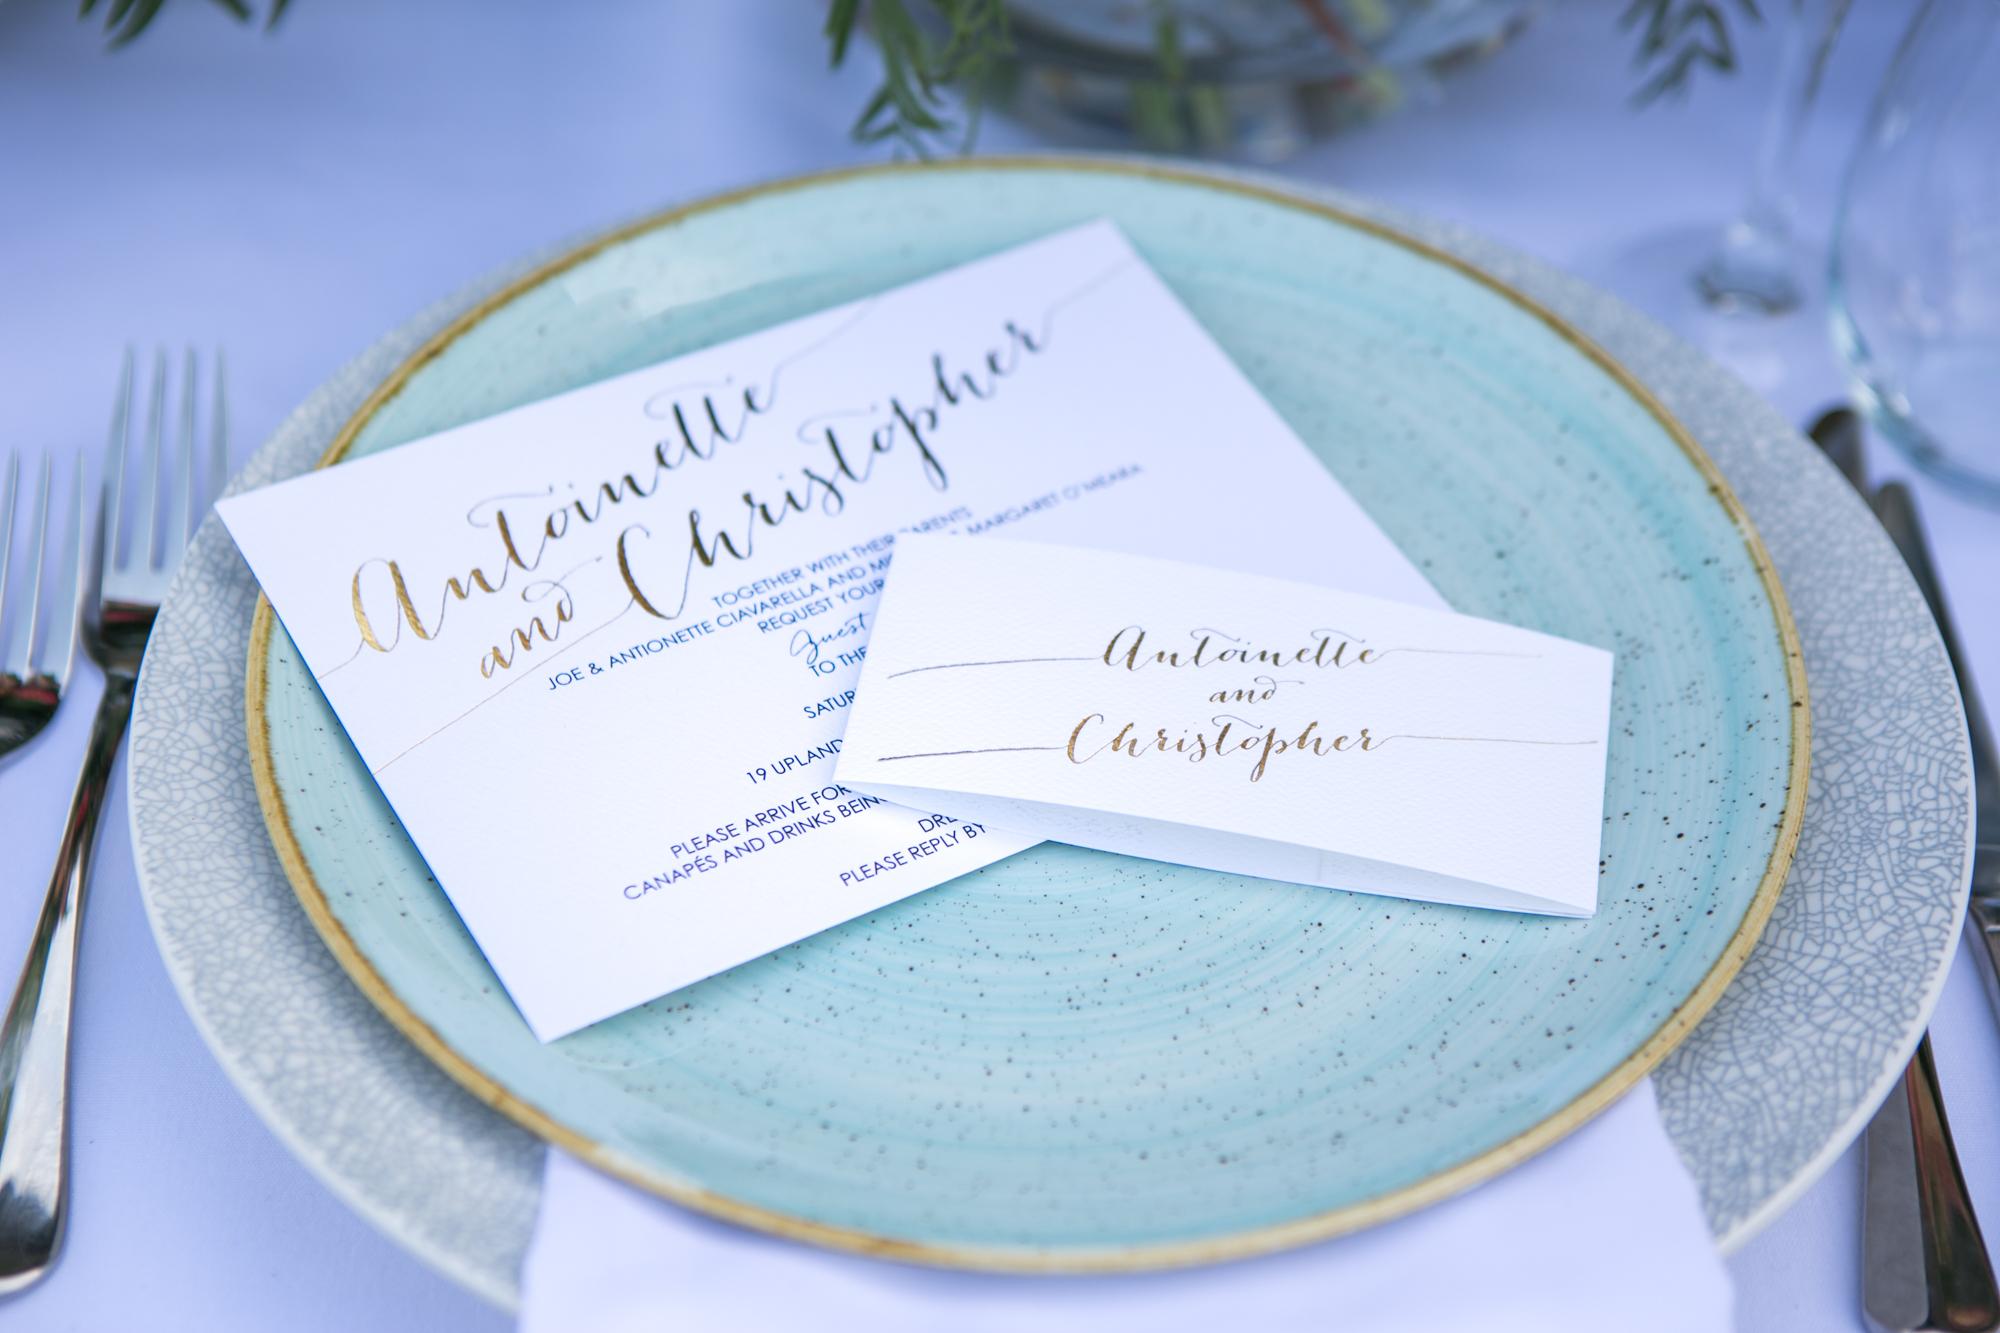 Creative-Distinction-wedding-invitation-LR-96.jpg